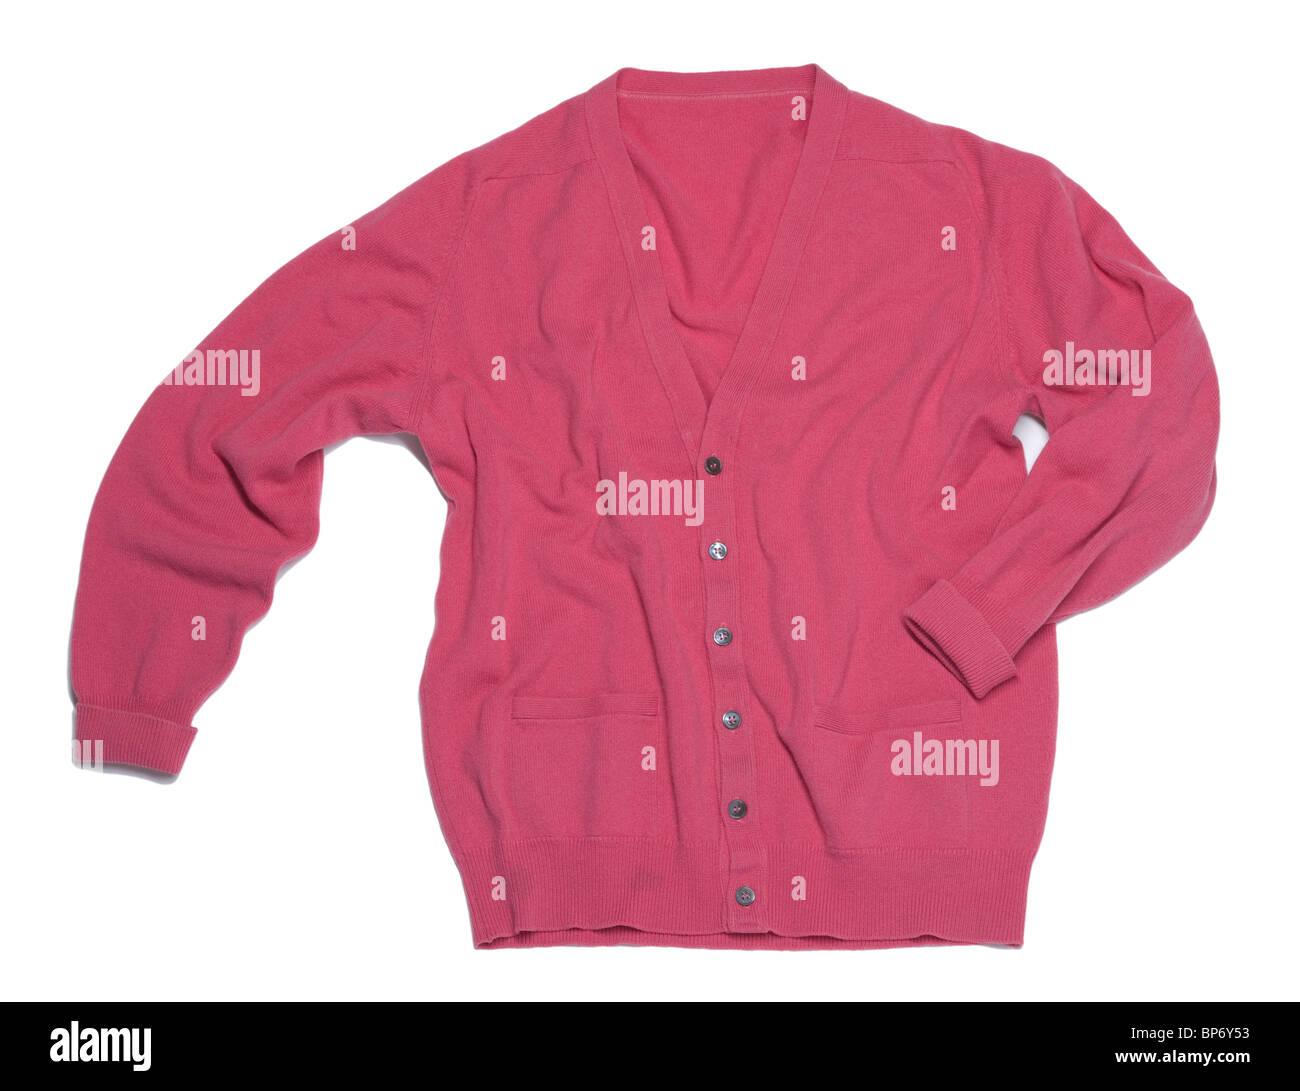 Pink woolen cardigan - Stock Image